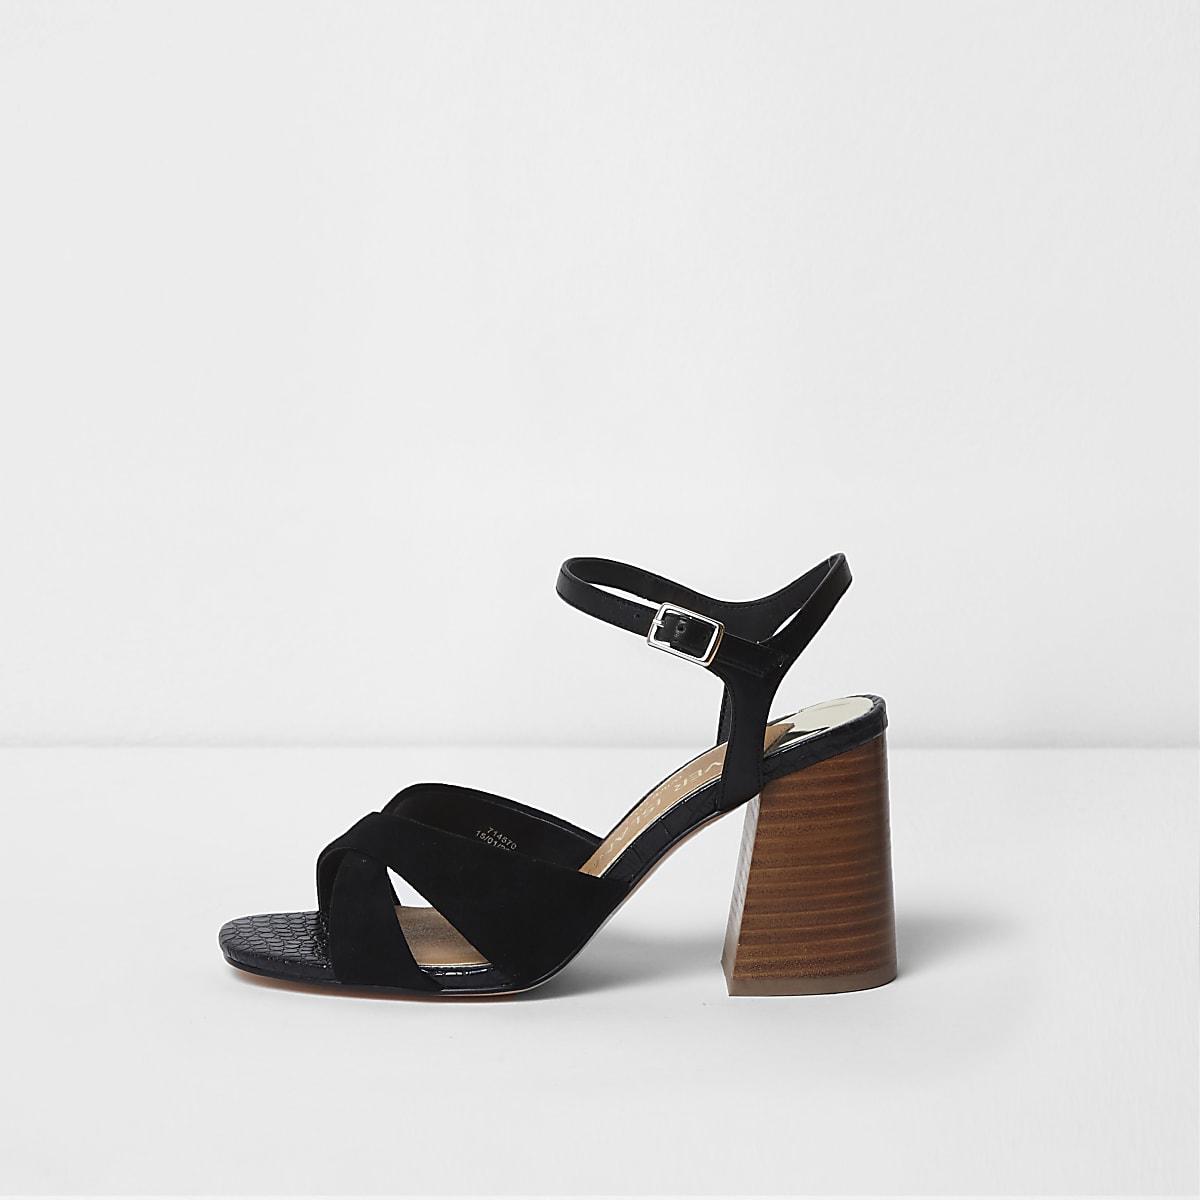 2baa73d075 Black wide fit cross strap block heel sandals - Sandals - Shoes & Boots -  women